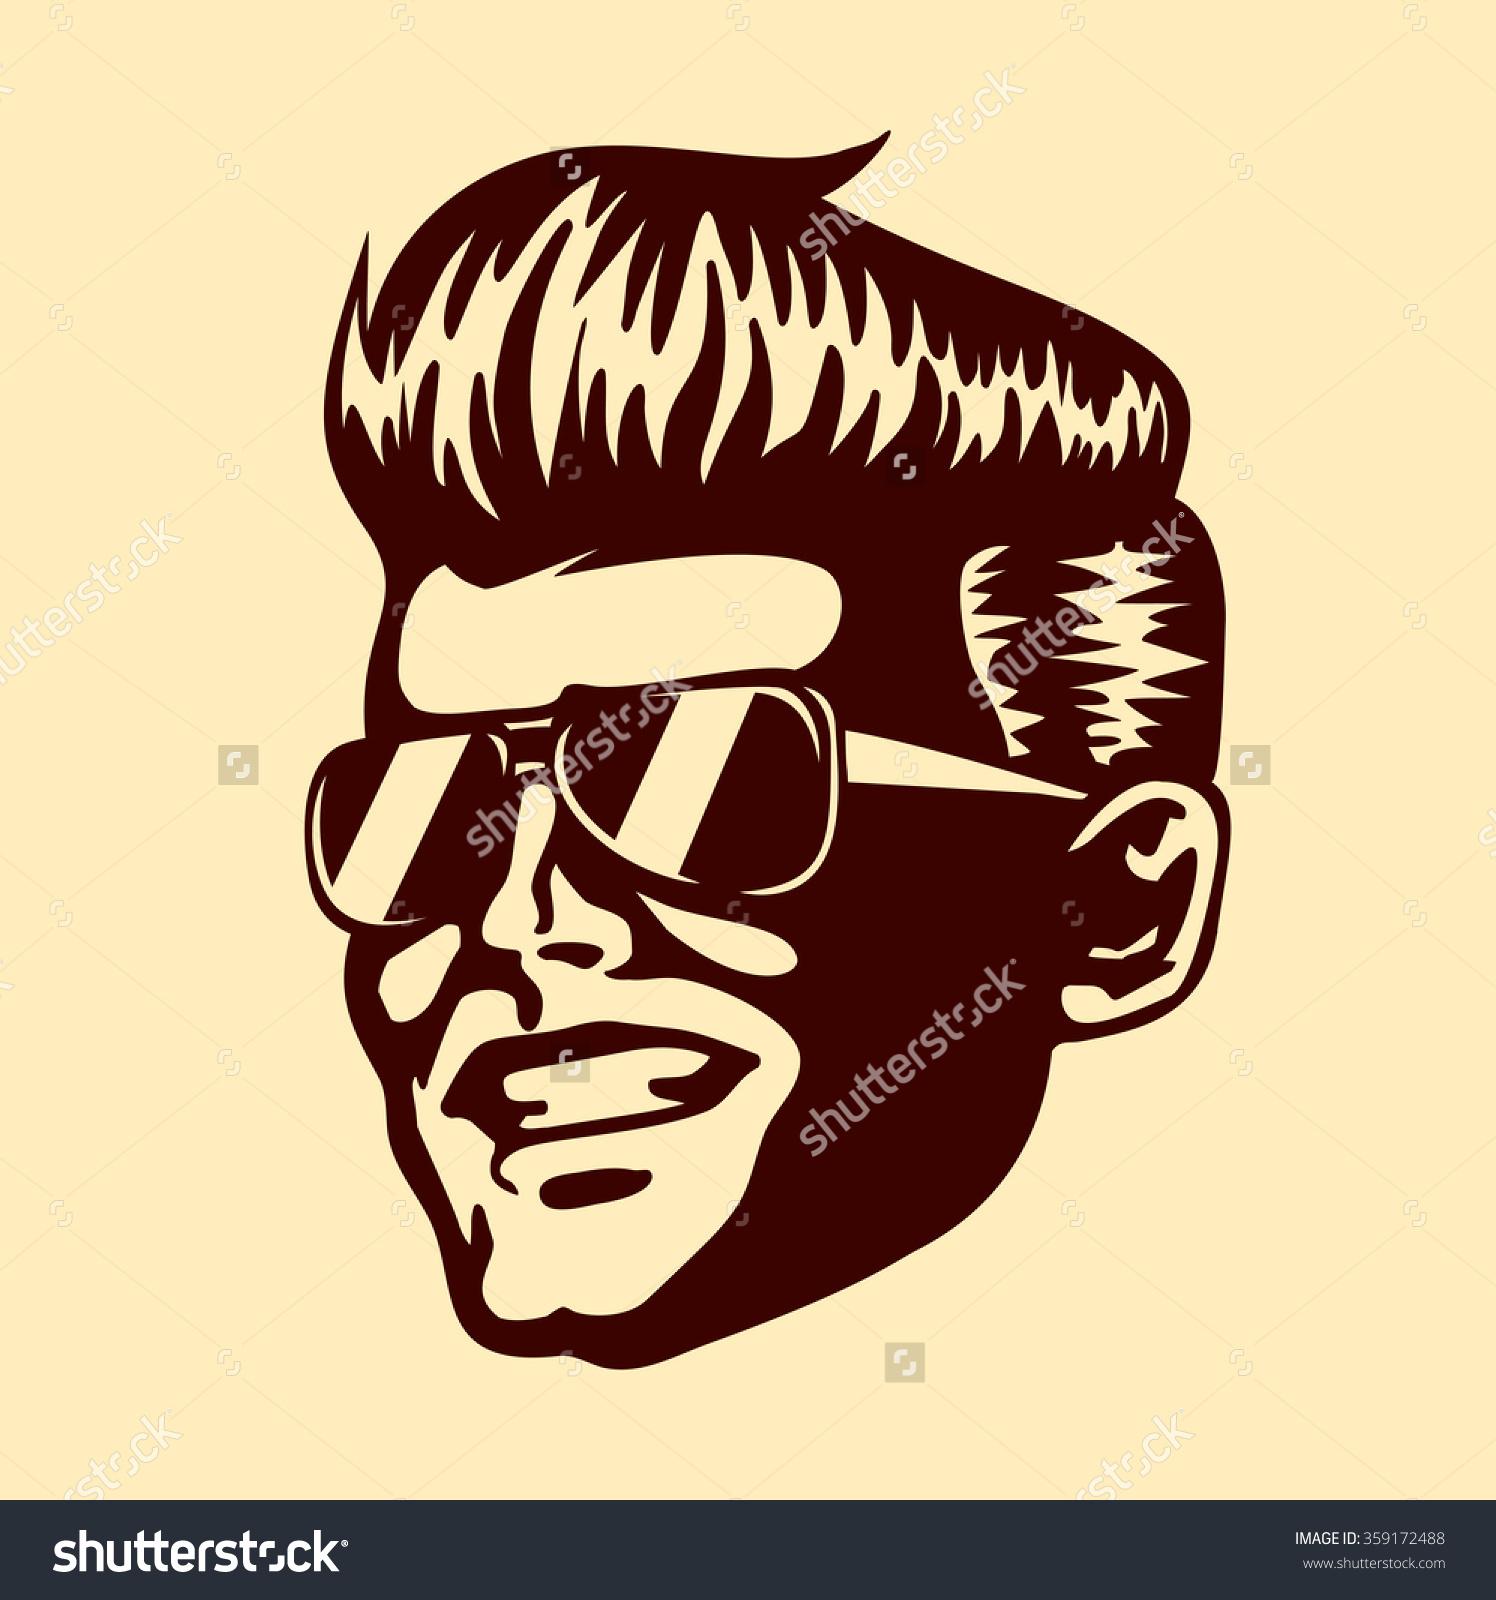 Vintage Retro Cool Dude Man Face Stock Vector 359172488.